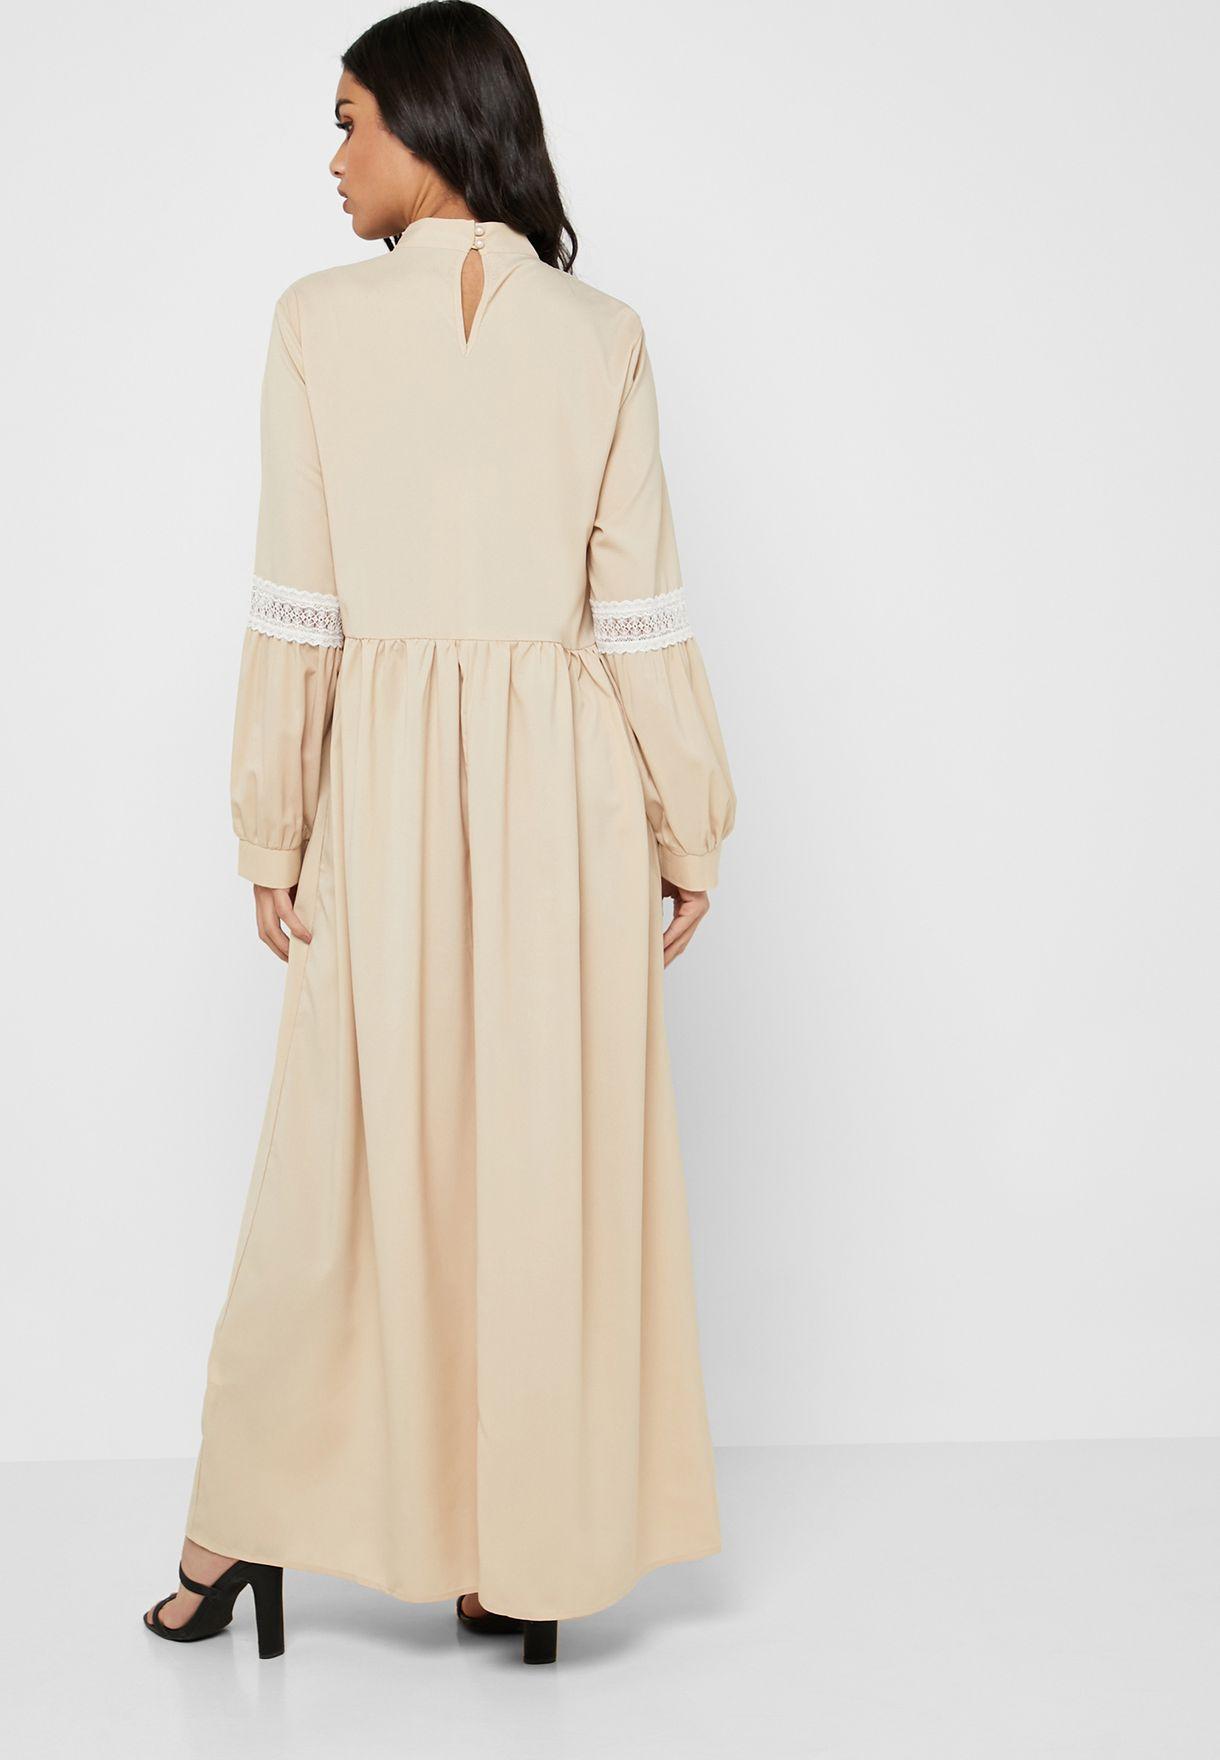 فستان بتداخلات دانتيل